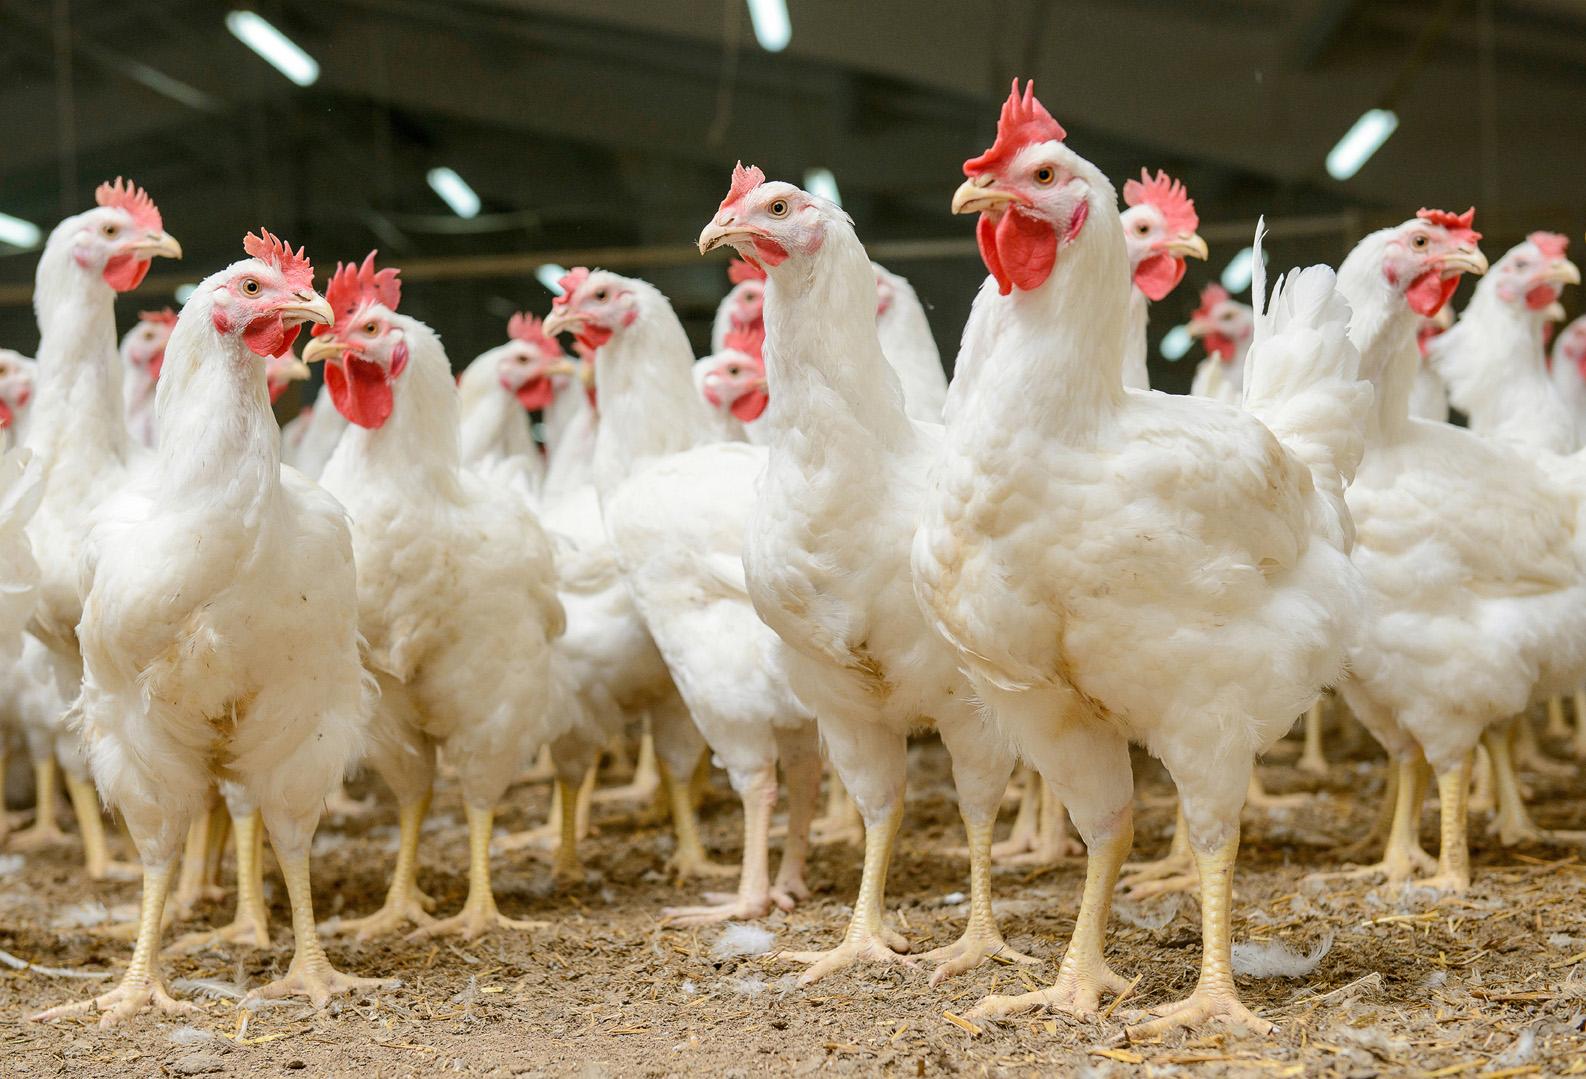 Bird flu roadshows to prepare for future outbreaks